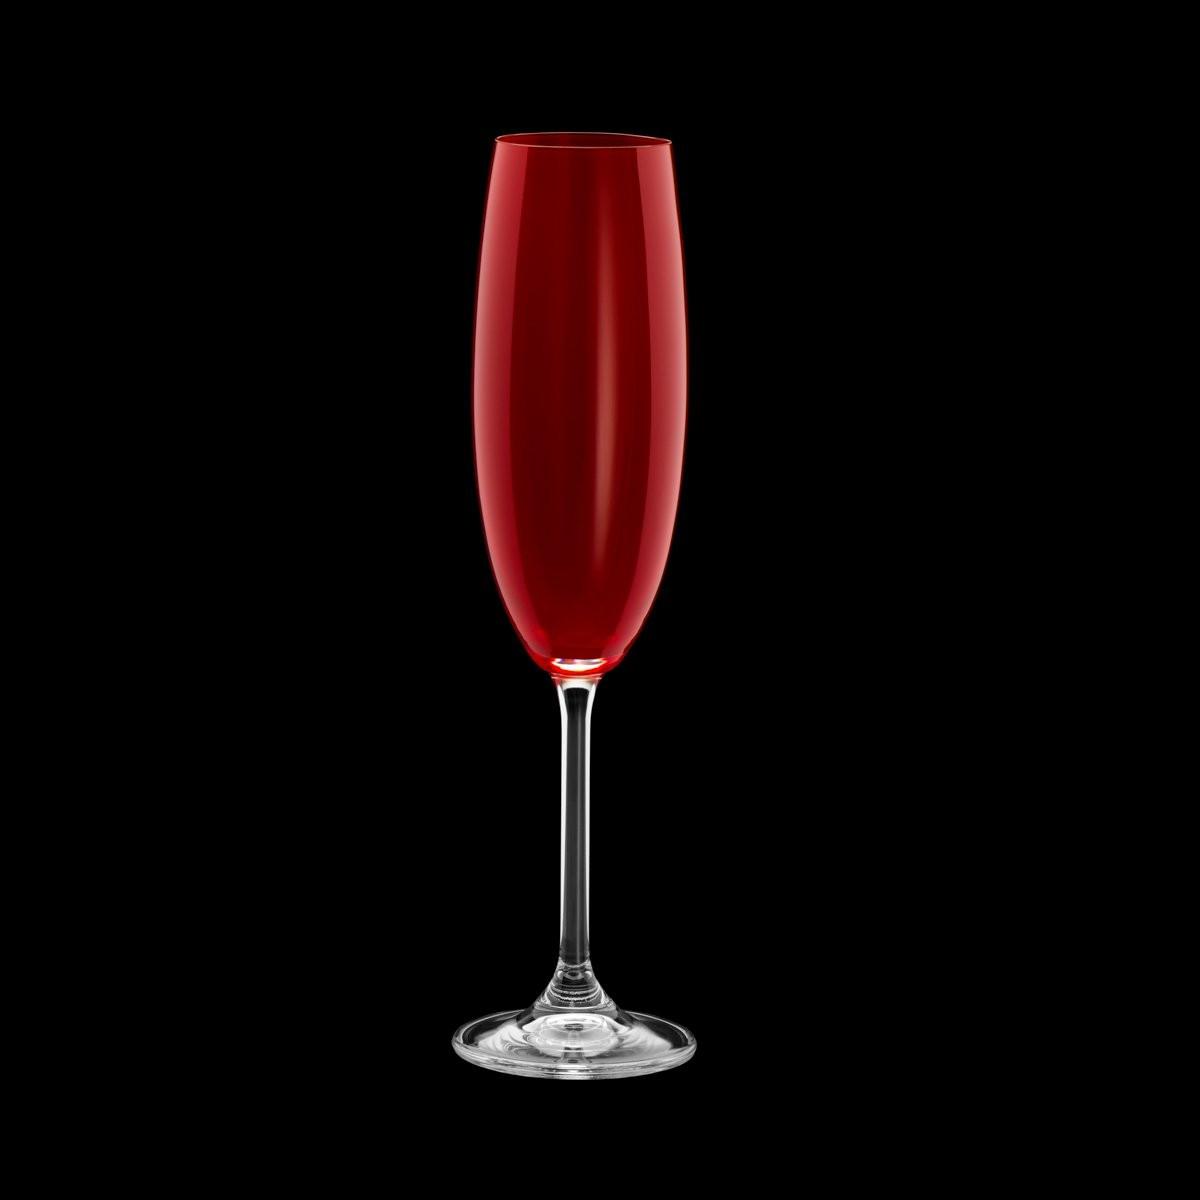 Jogo 6 taças 220ml para champagne de cristal ecológico rubi Gastro Bohemia - 35043